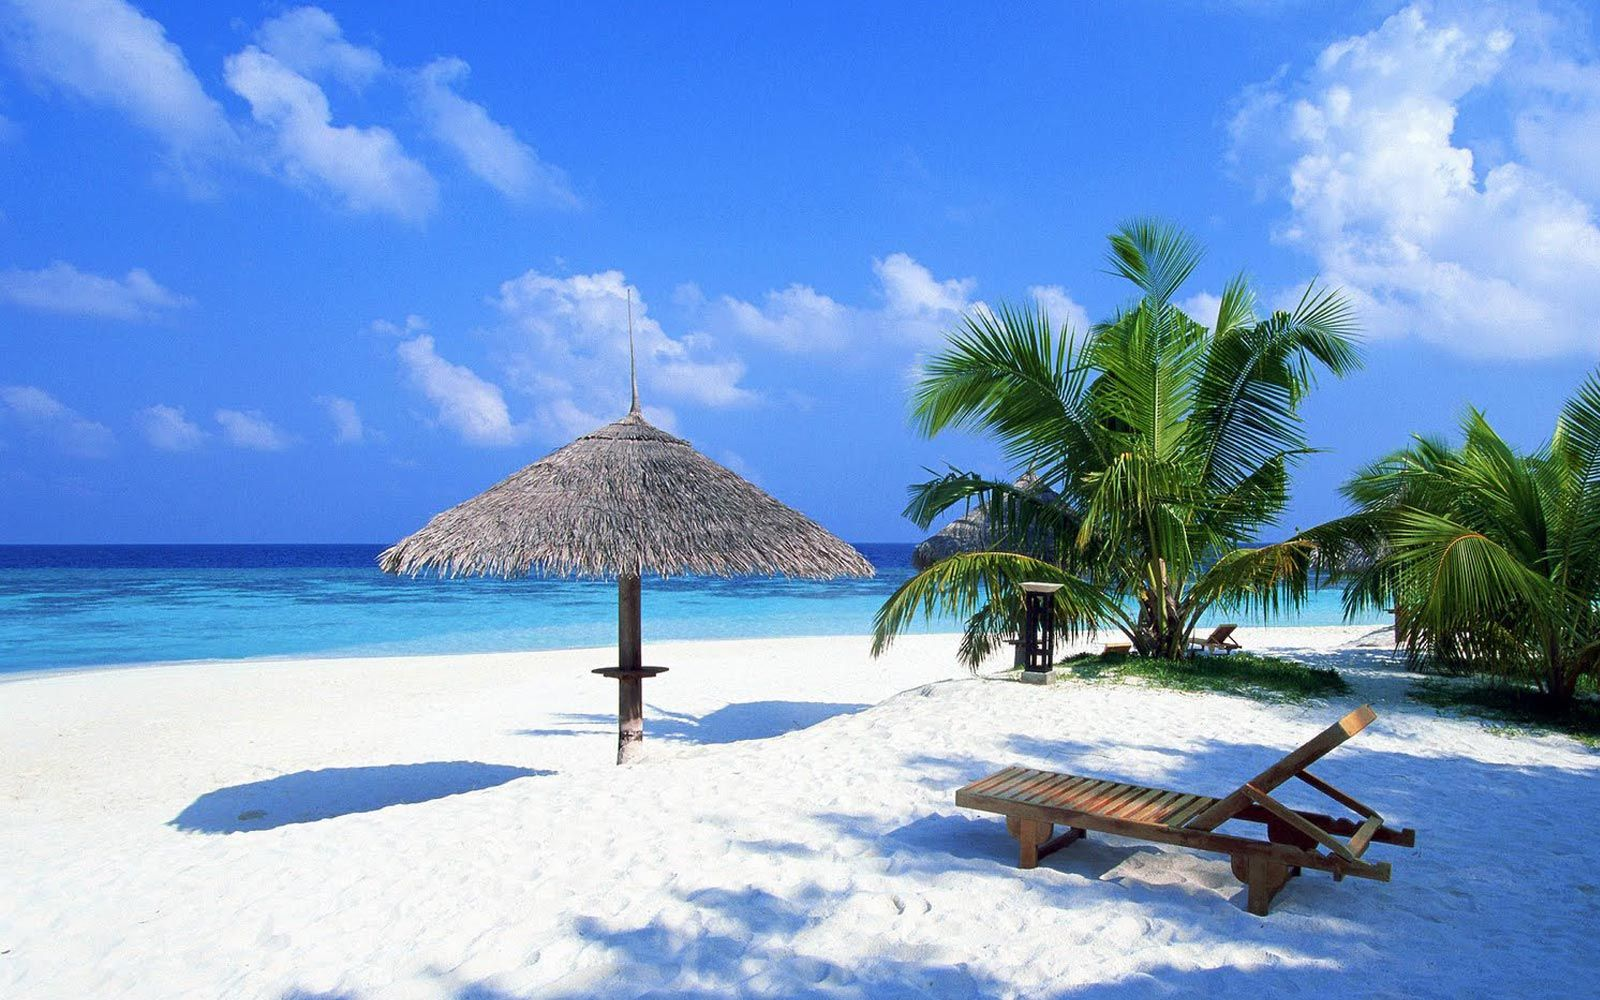 West Palm Beach Florida Wallpaper Beaches In The